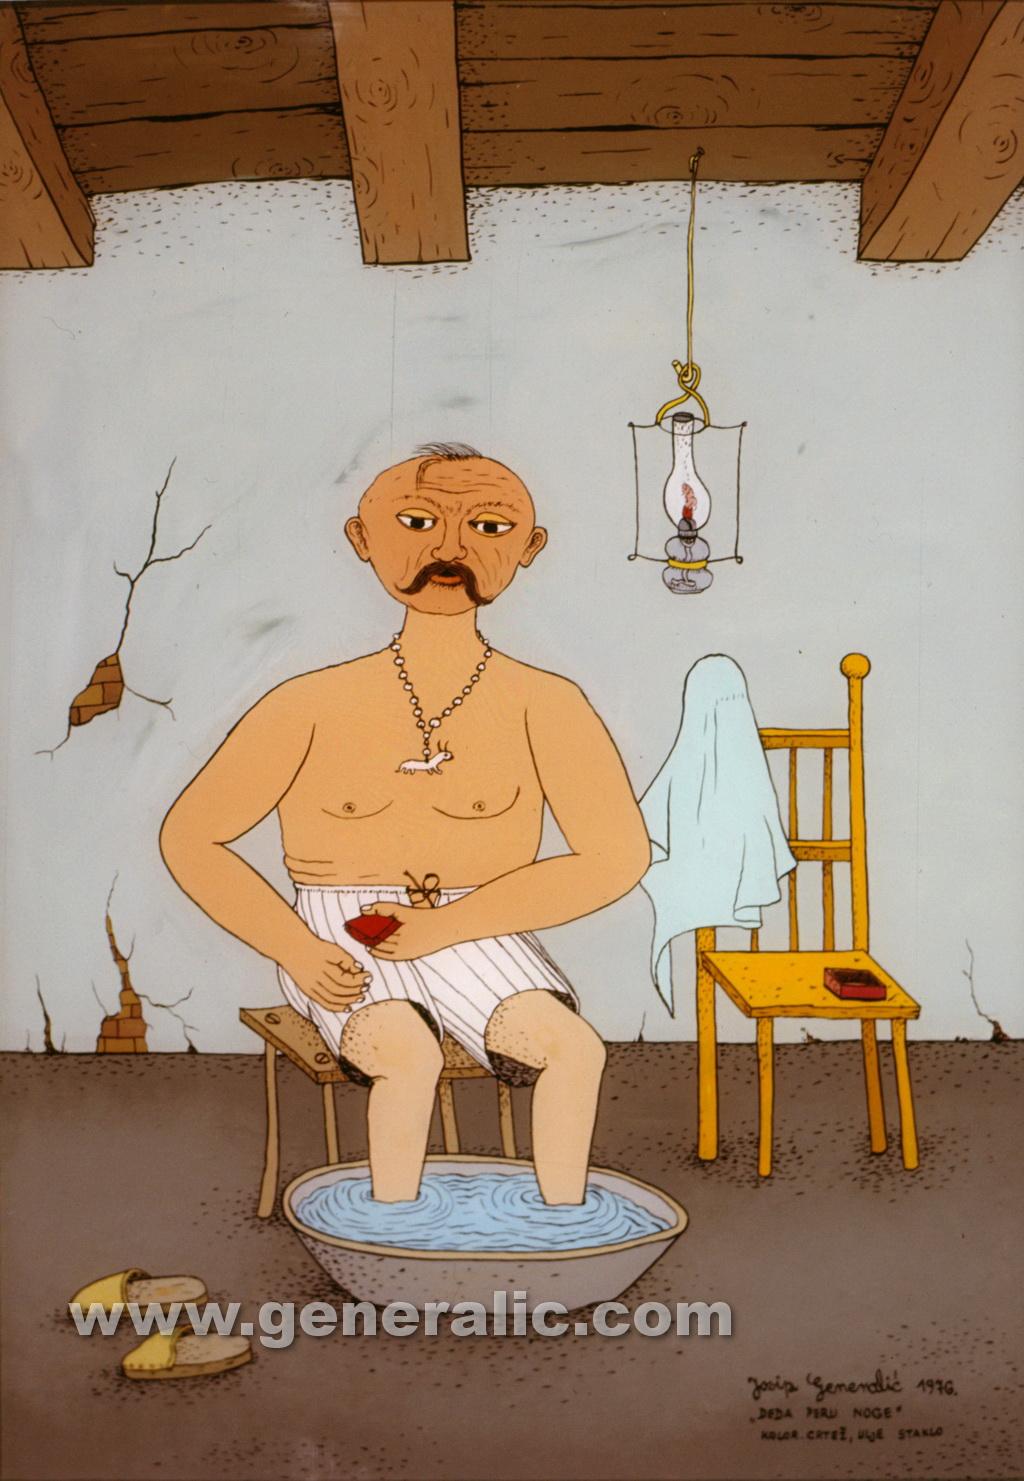 Josip Generalic, 1976, Grandpa is washing feet, oil on glass